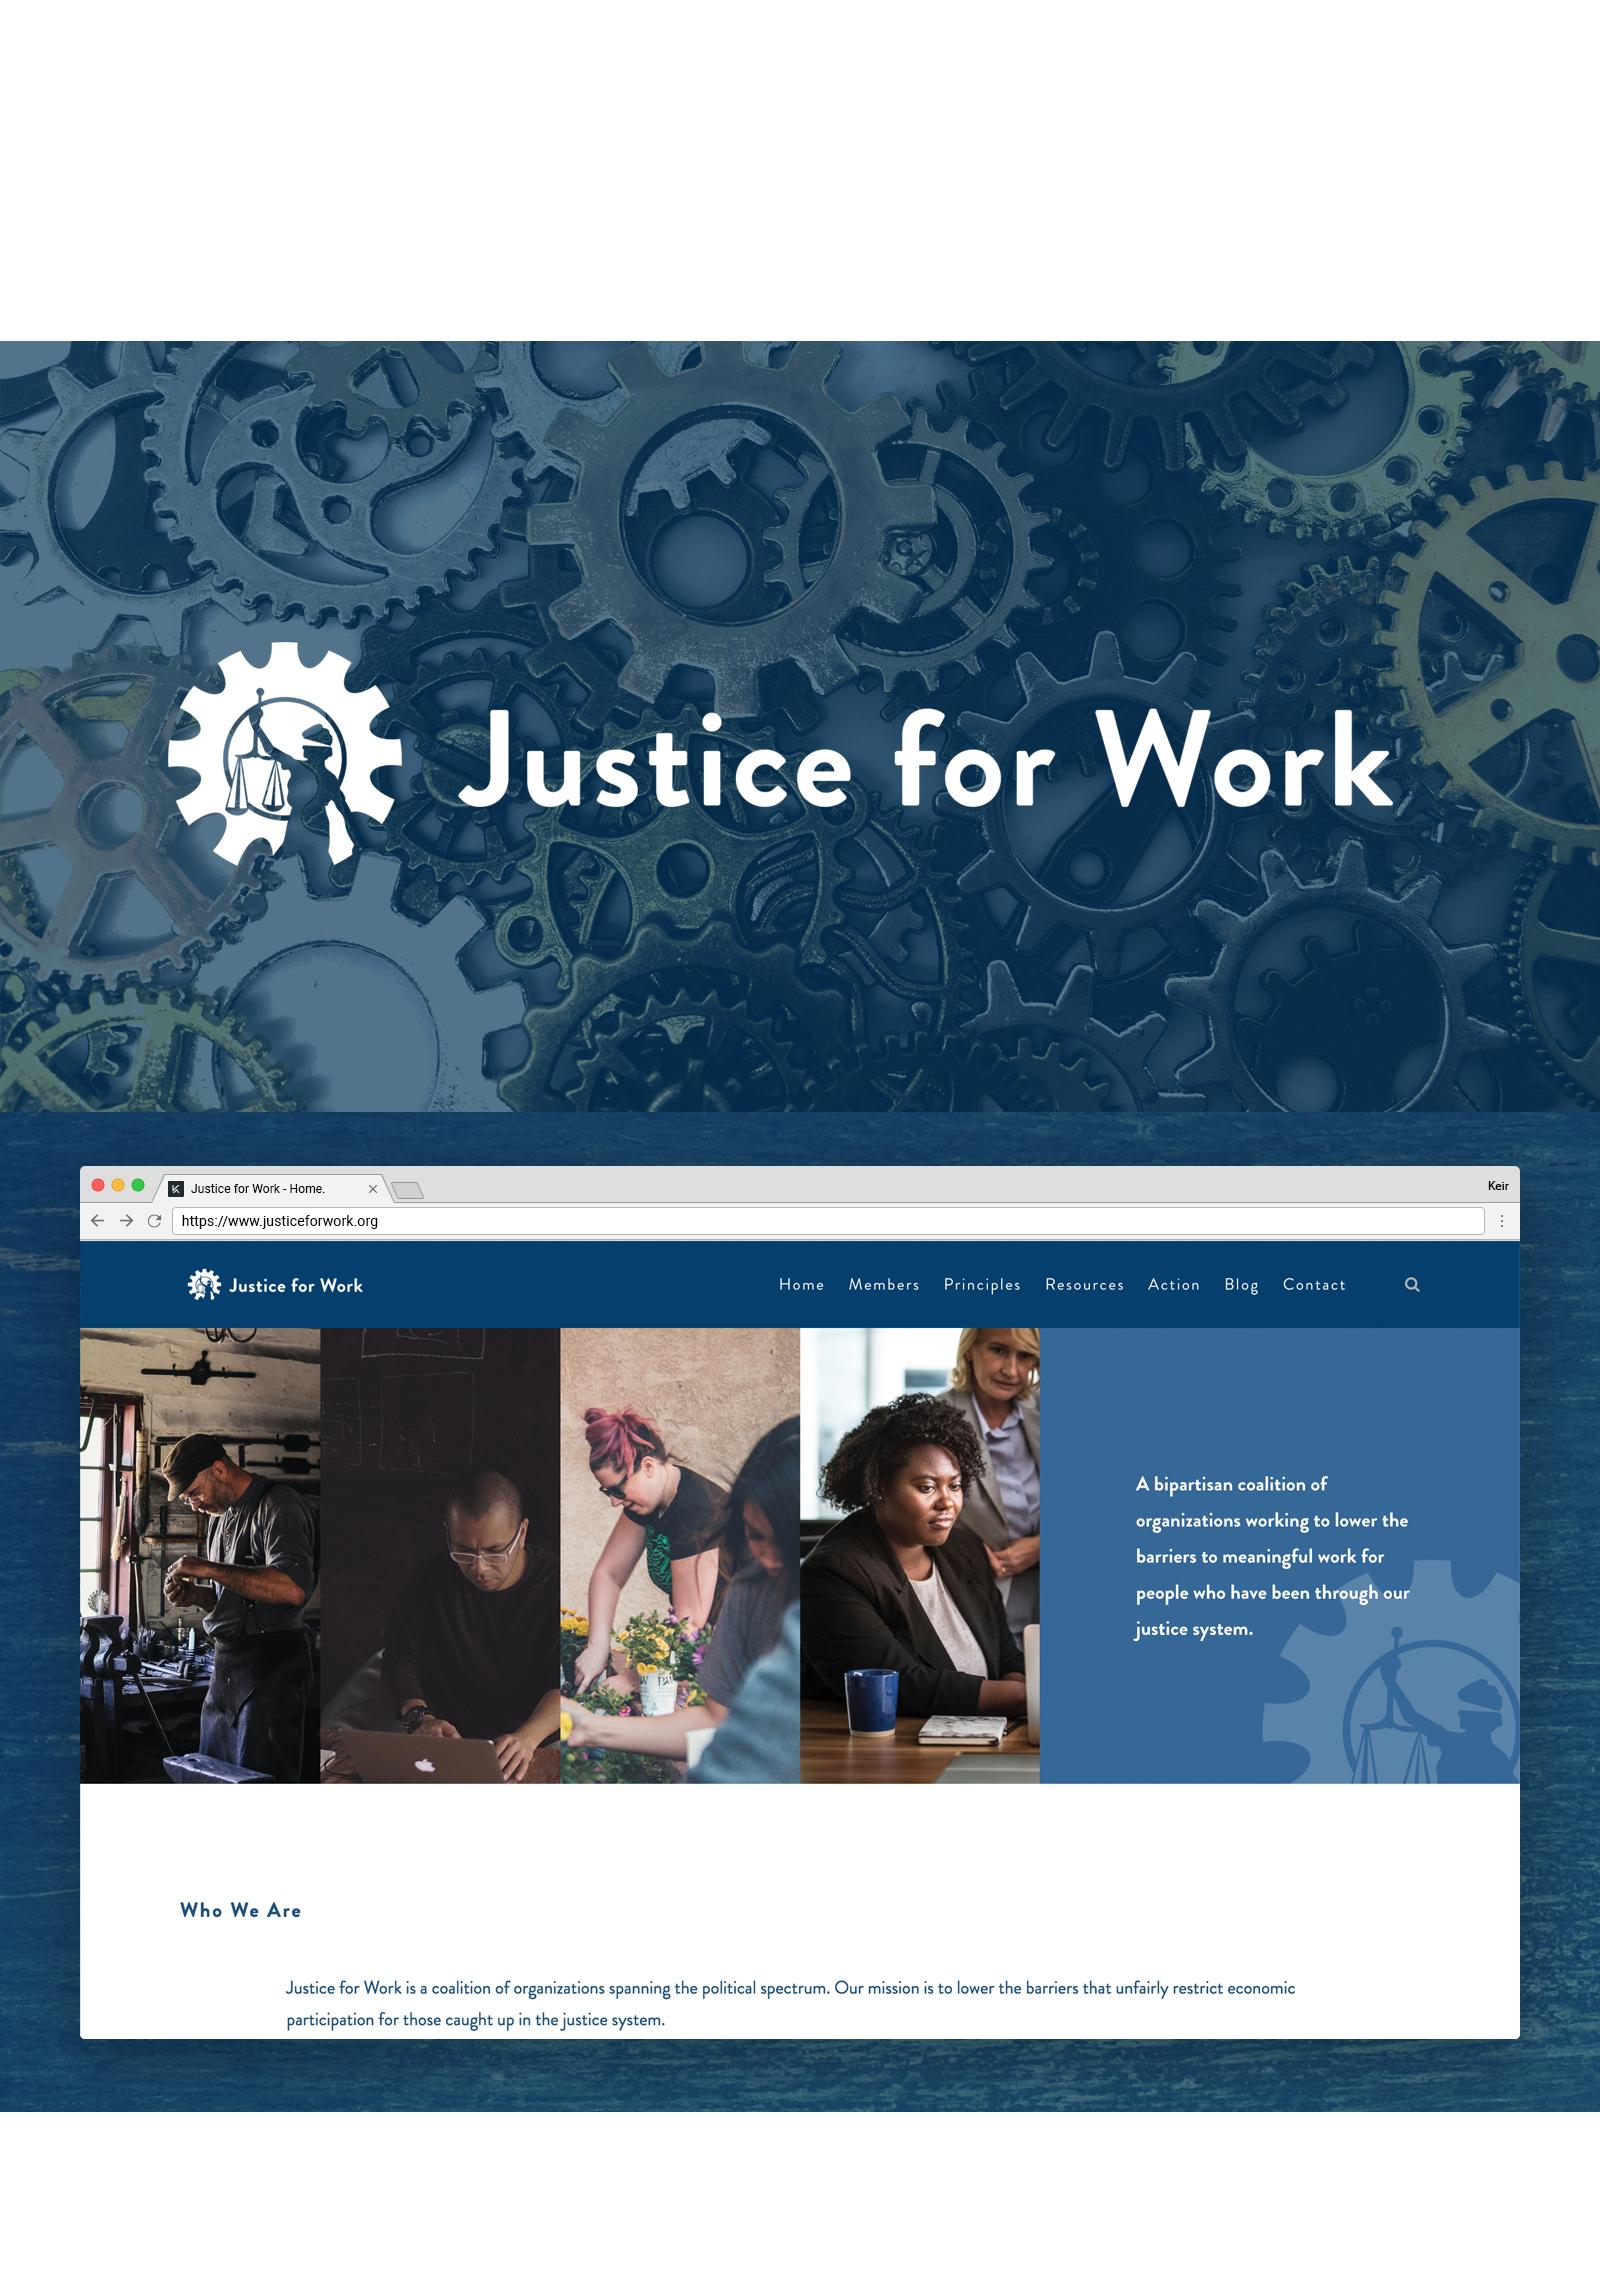 JusticeforWorkWebsiteandLogoMockup.png